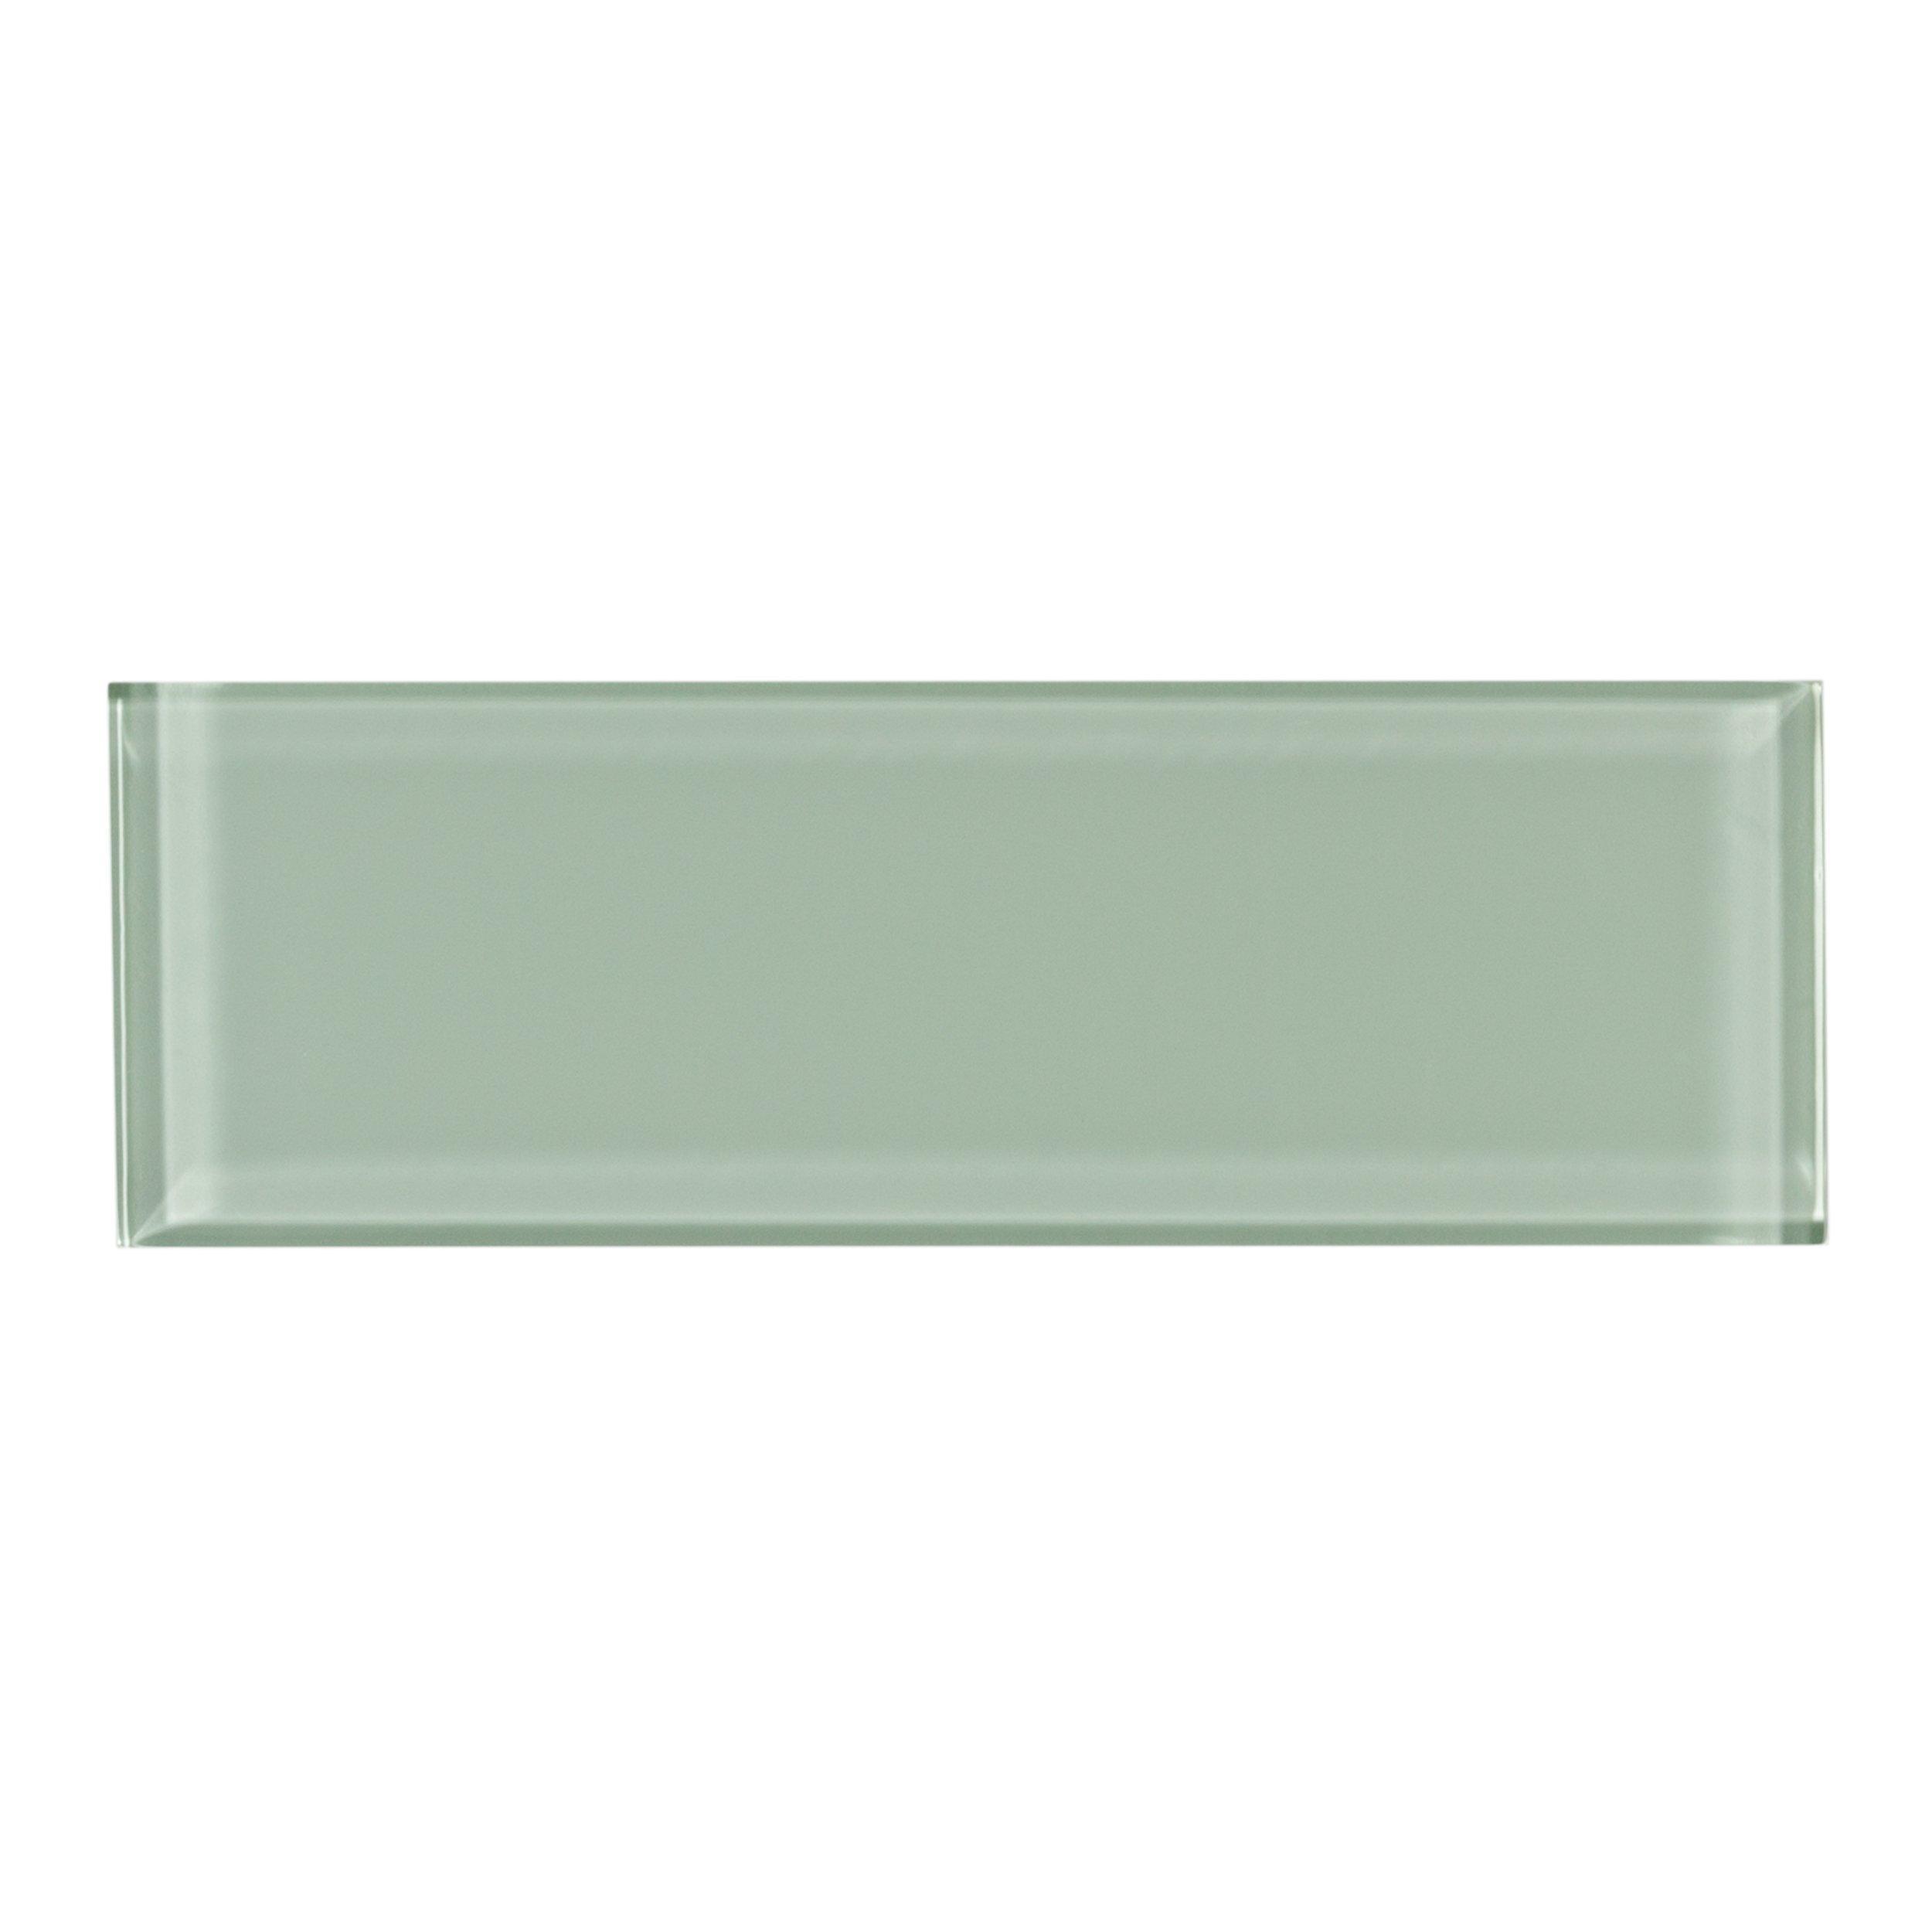 caribbean green marble tile 3 x 9